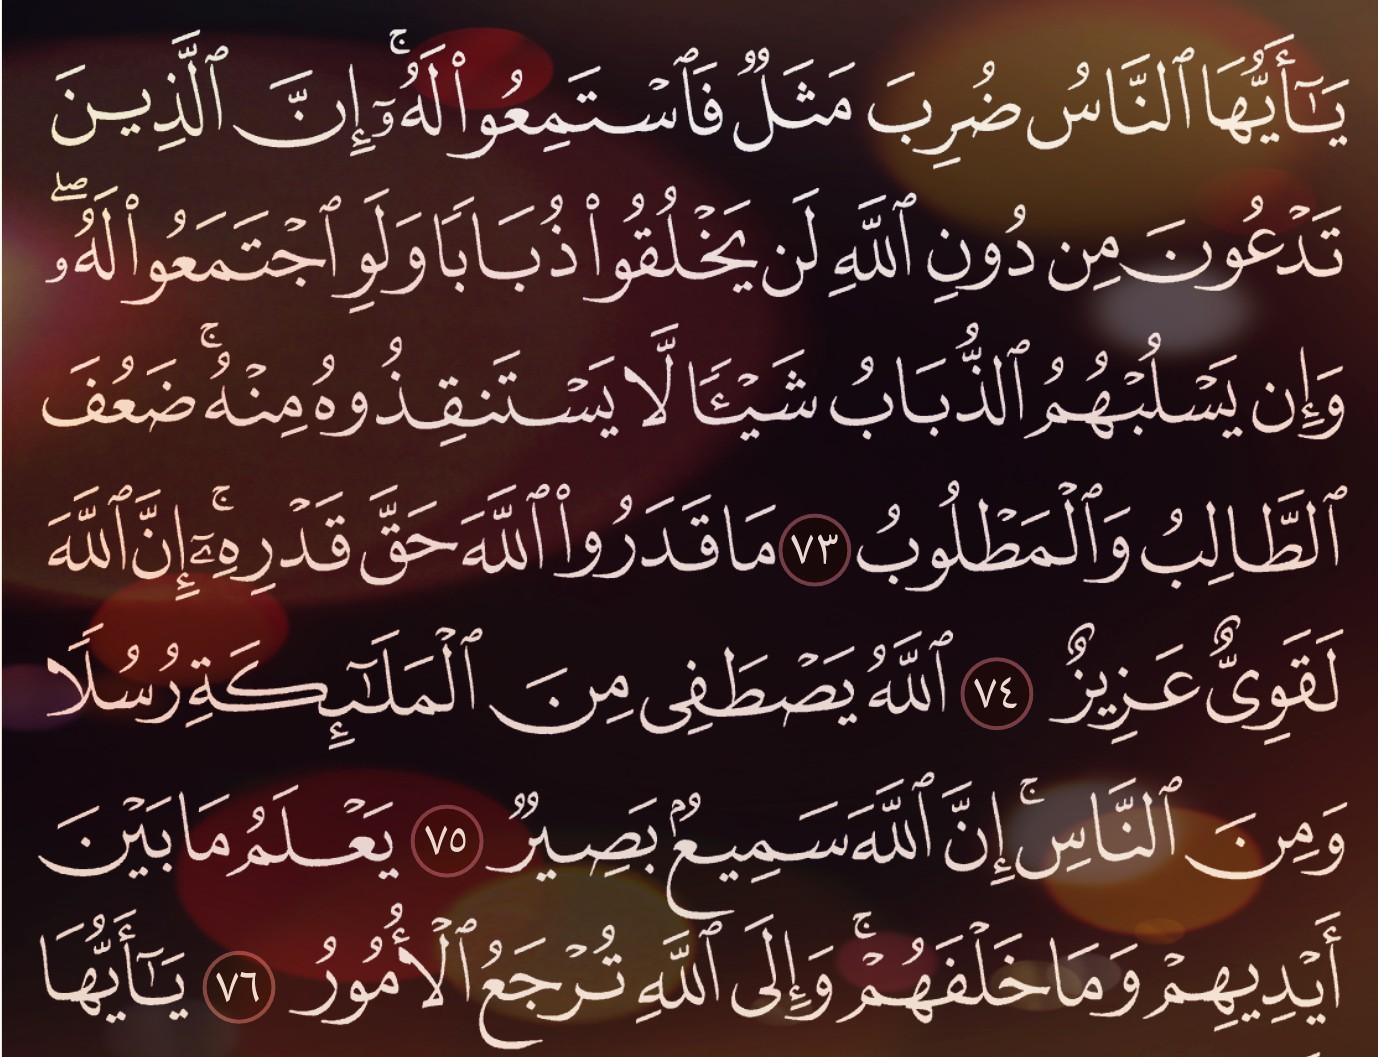 surah rahman,quran,geo,surah yaseen,holy,dua,surah baqarah,stress,mufti menk,quran recitation,al mulk,quran tilawat,dzikir pagi,islam sobhi,nouman ali khan,allah,yaseen,al,surah al mulk,surah yasin,morning,surah maryam,ayat kursi,mishary rashid alafasy,al quran,هزاع البلوشي,murottal alquran merdu,omar suleiman,سورة مريم,surah,surah al kahfi,muhammad,سورة الملك,سورة,تلاوة,koran,تلاوة خاشعة,surah fatah,al falaq,surah al kahfi full, شرح وتفسير, سورة الحج, Surah Al Hajj,  ( من الآية 73 إلى الاية 78 )